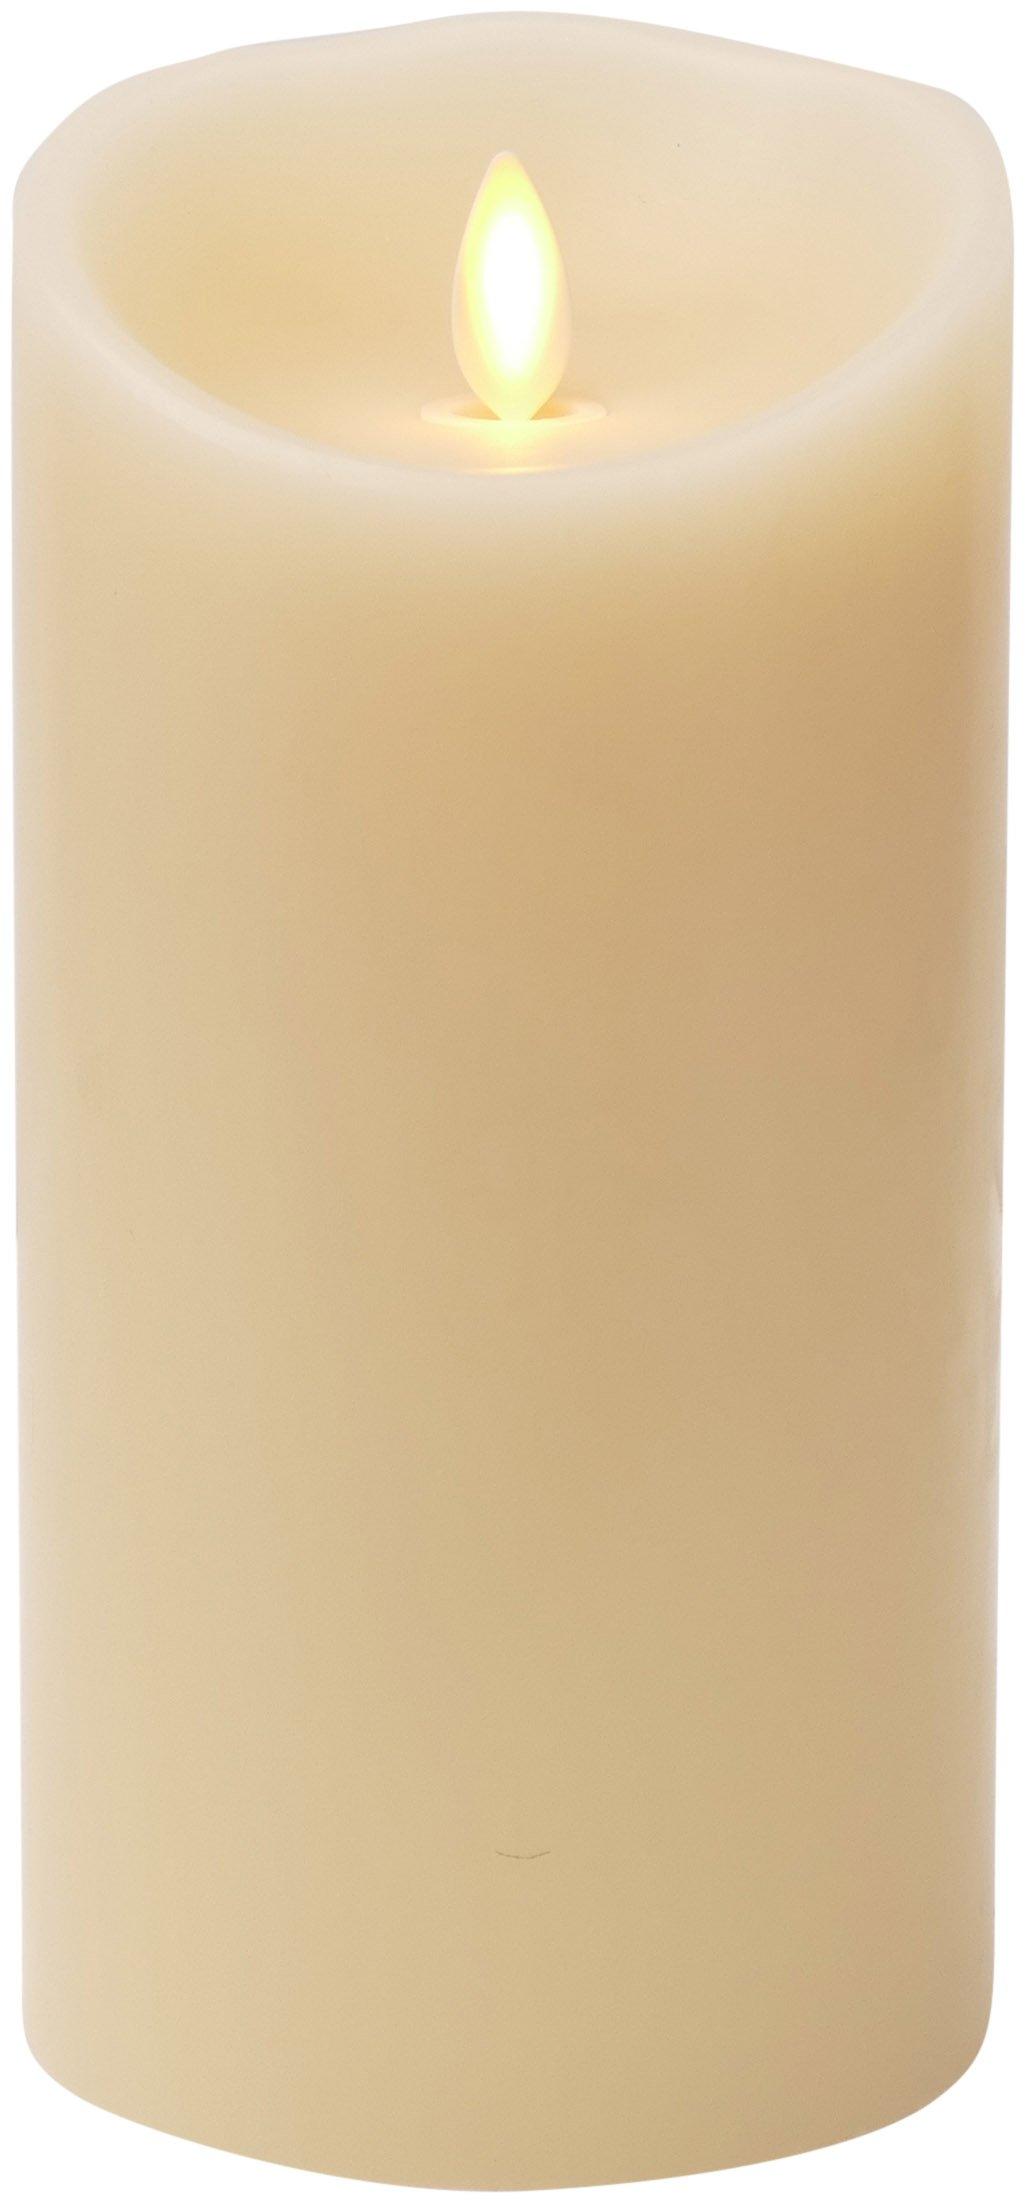 Luminara Flameless Candle - Vanilla Scented Ivory Wax Pillar - 7 in